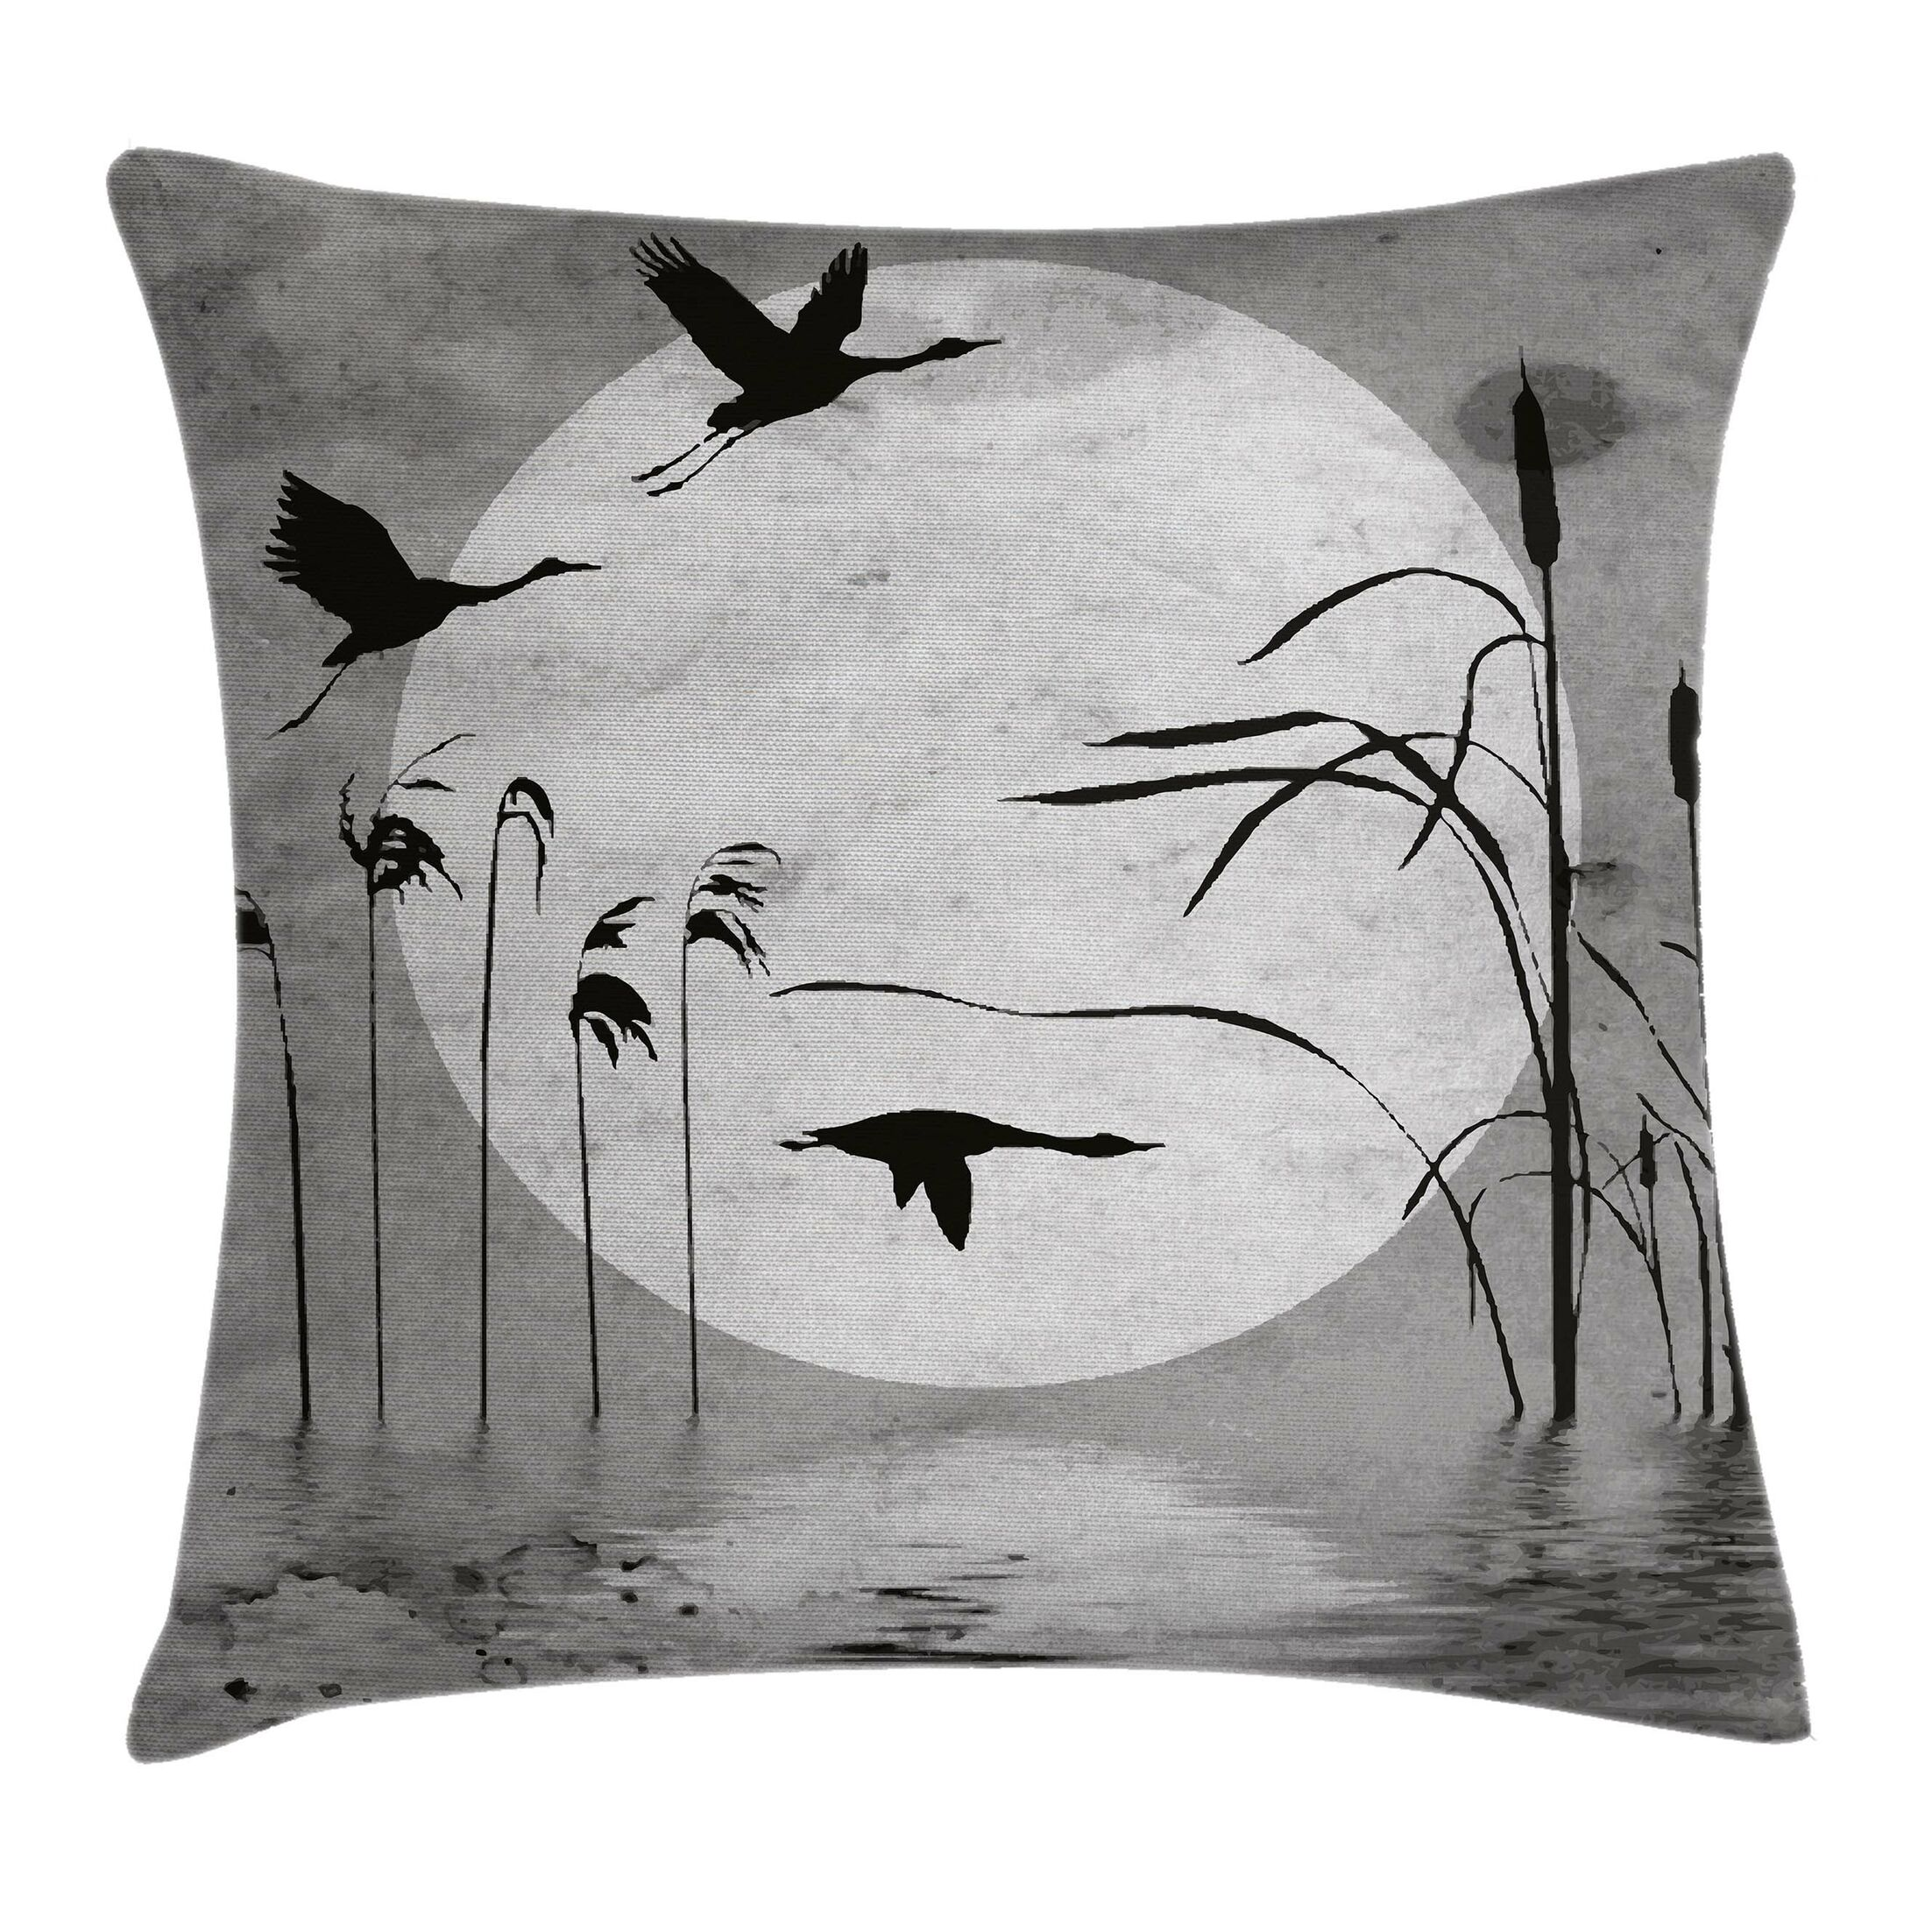 Grunge Heron Birds Pillow Cover Size: 24